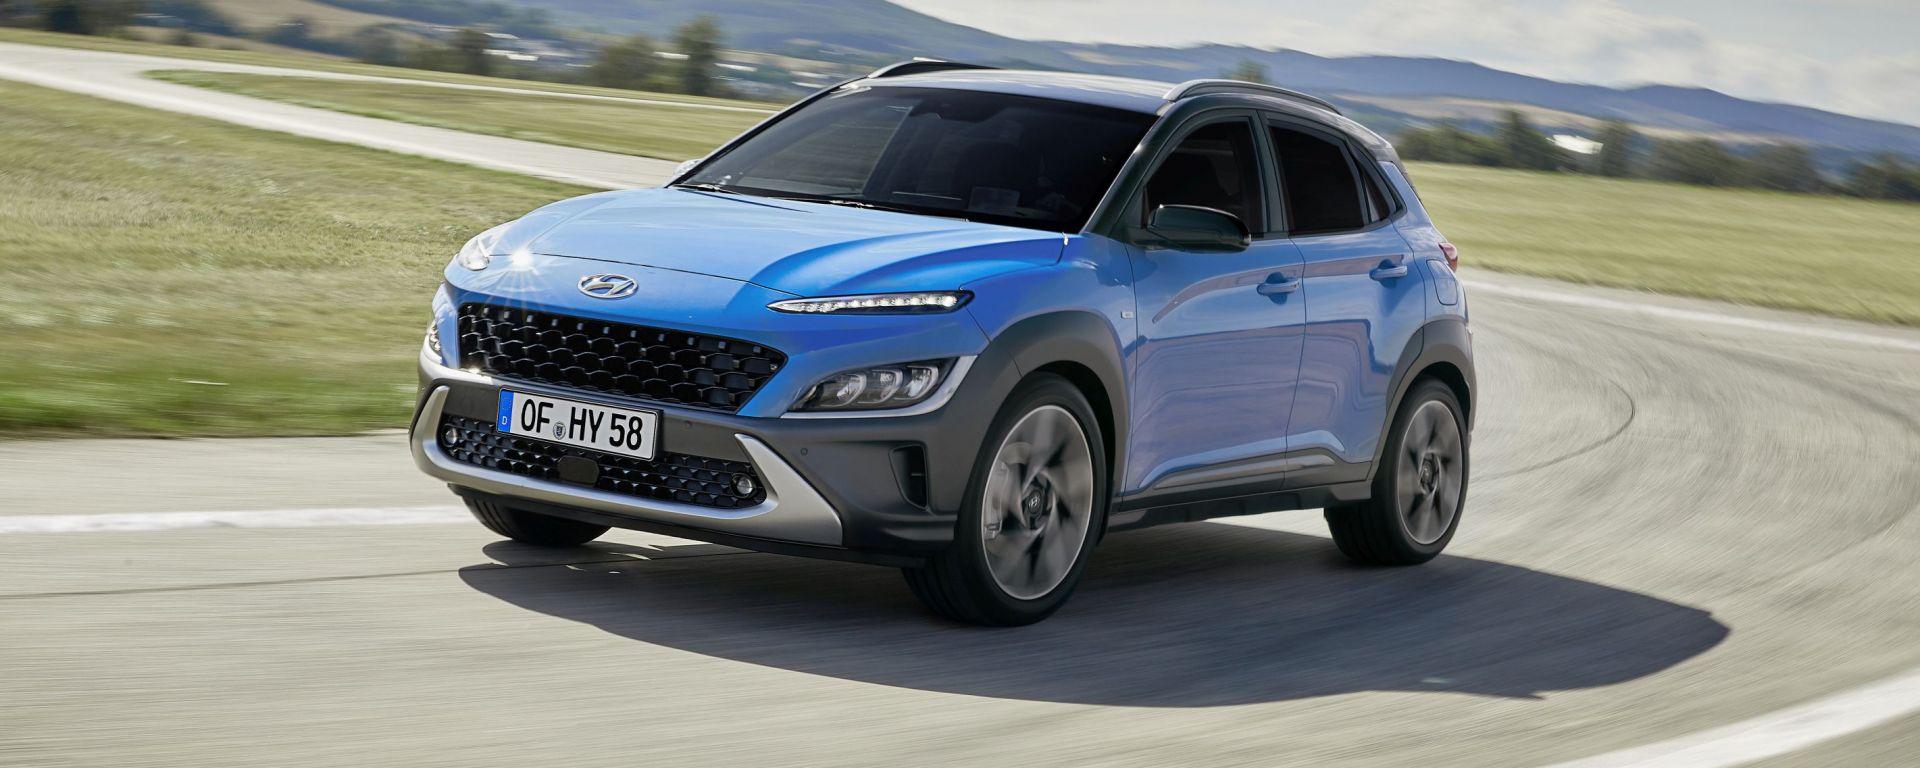 Hyundai Kona 2021 Full Hybrid: visuale di 3/4 anteriore